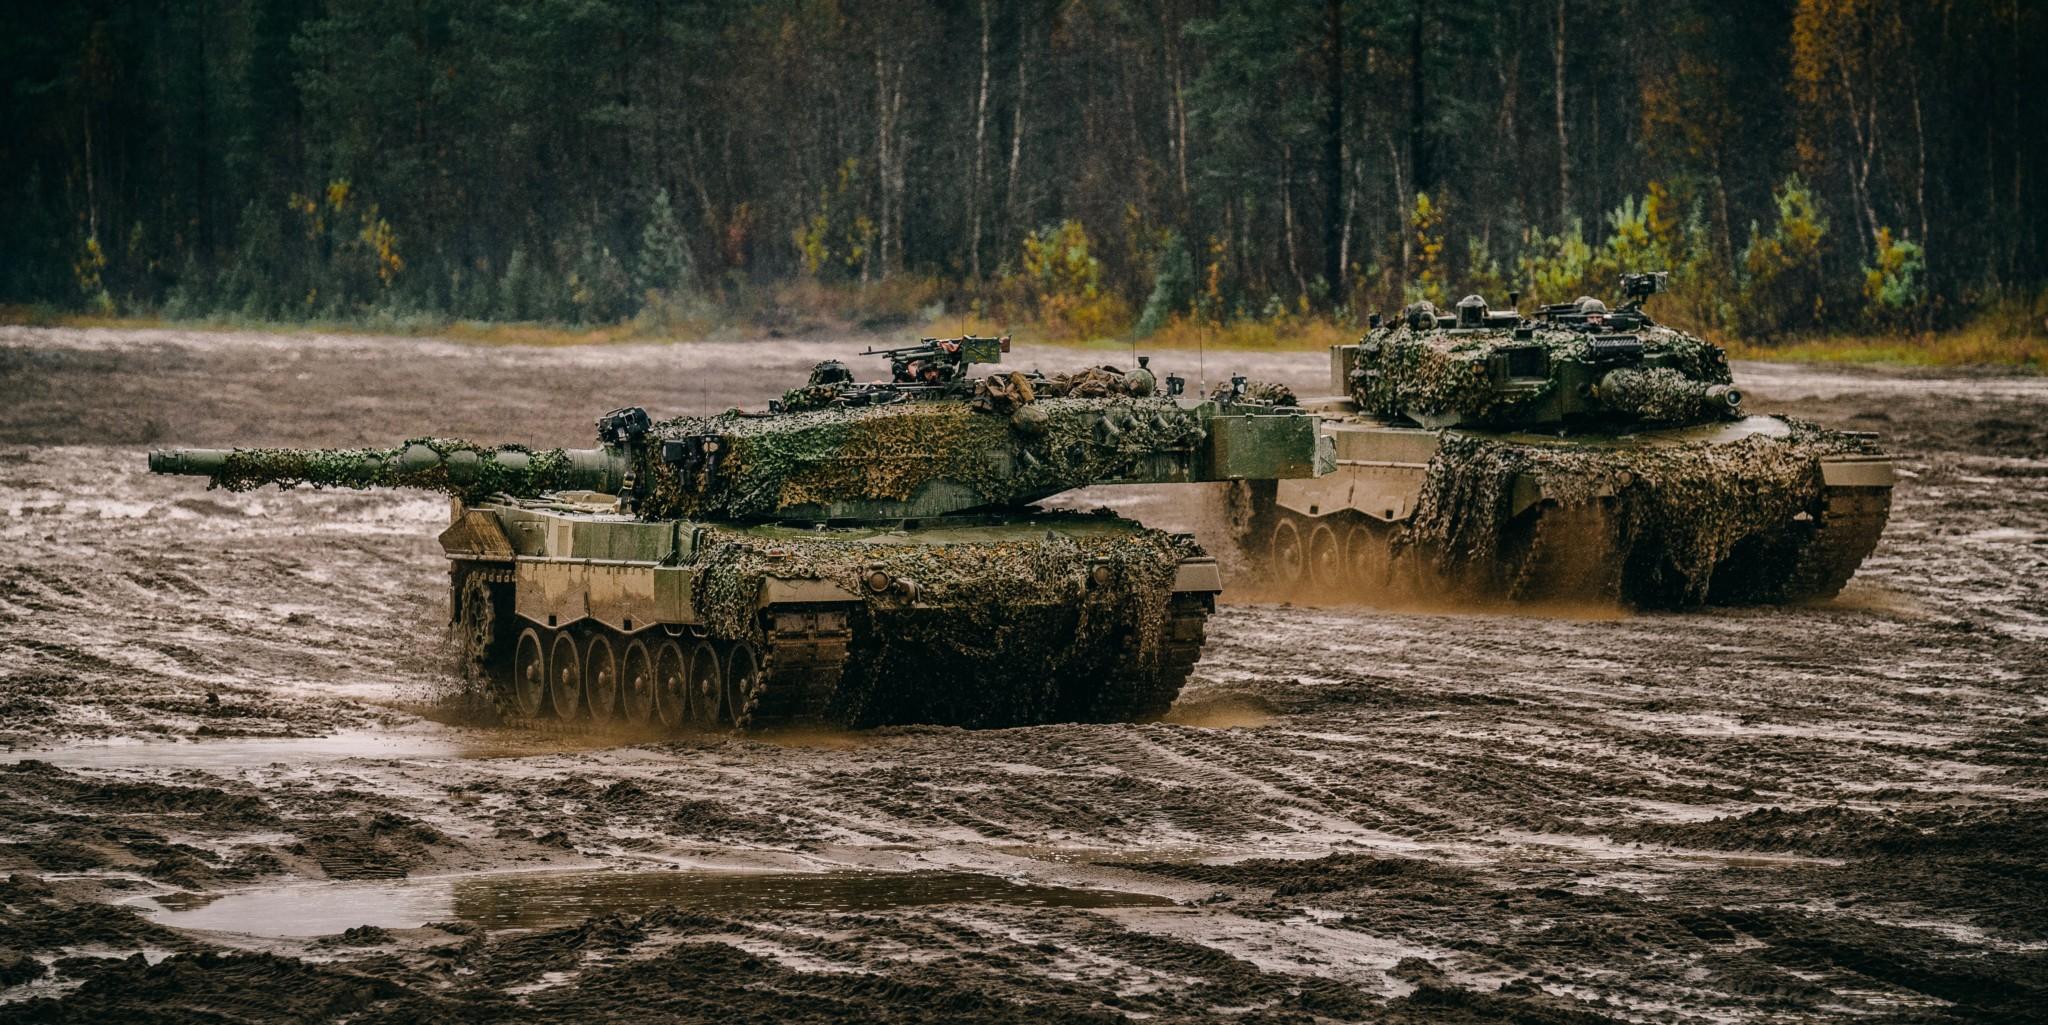 Ny stridsvognsutredning – nå hos FFI